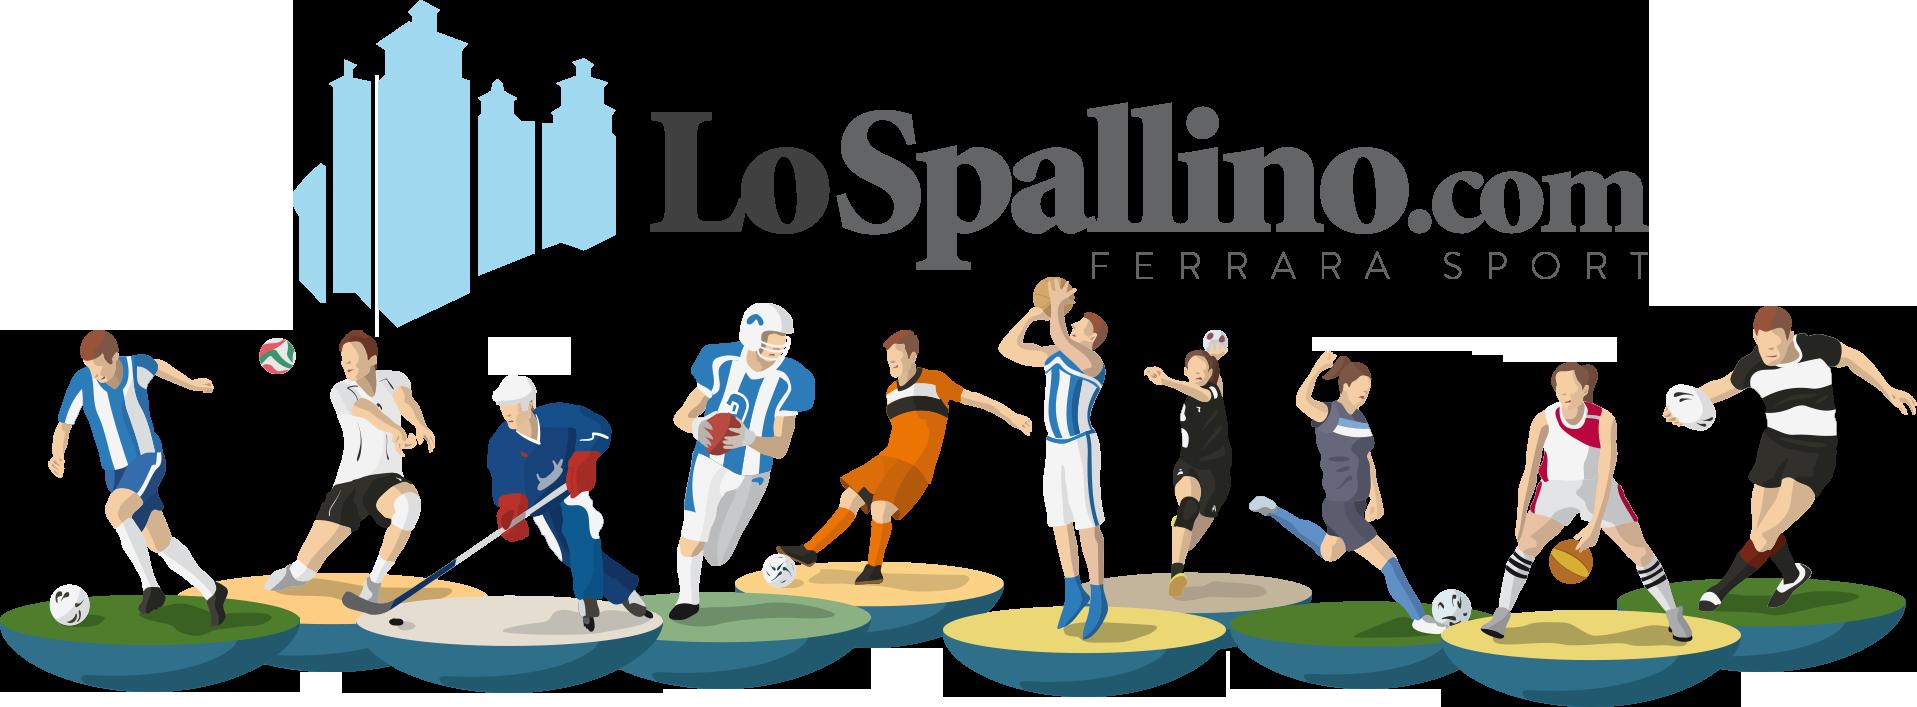 LoSpallino.com - Ferrara Sport Spal